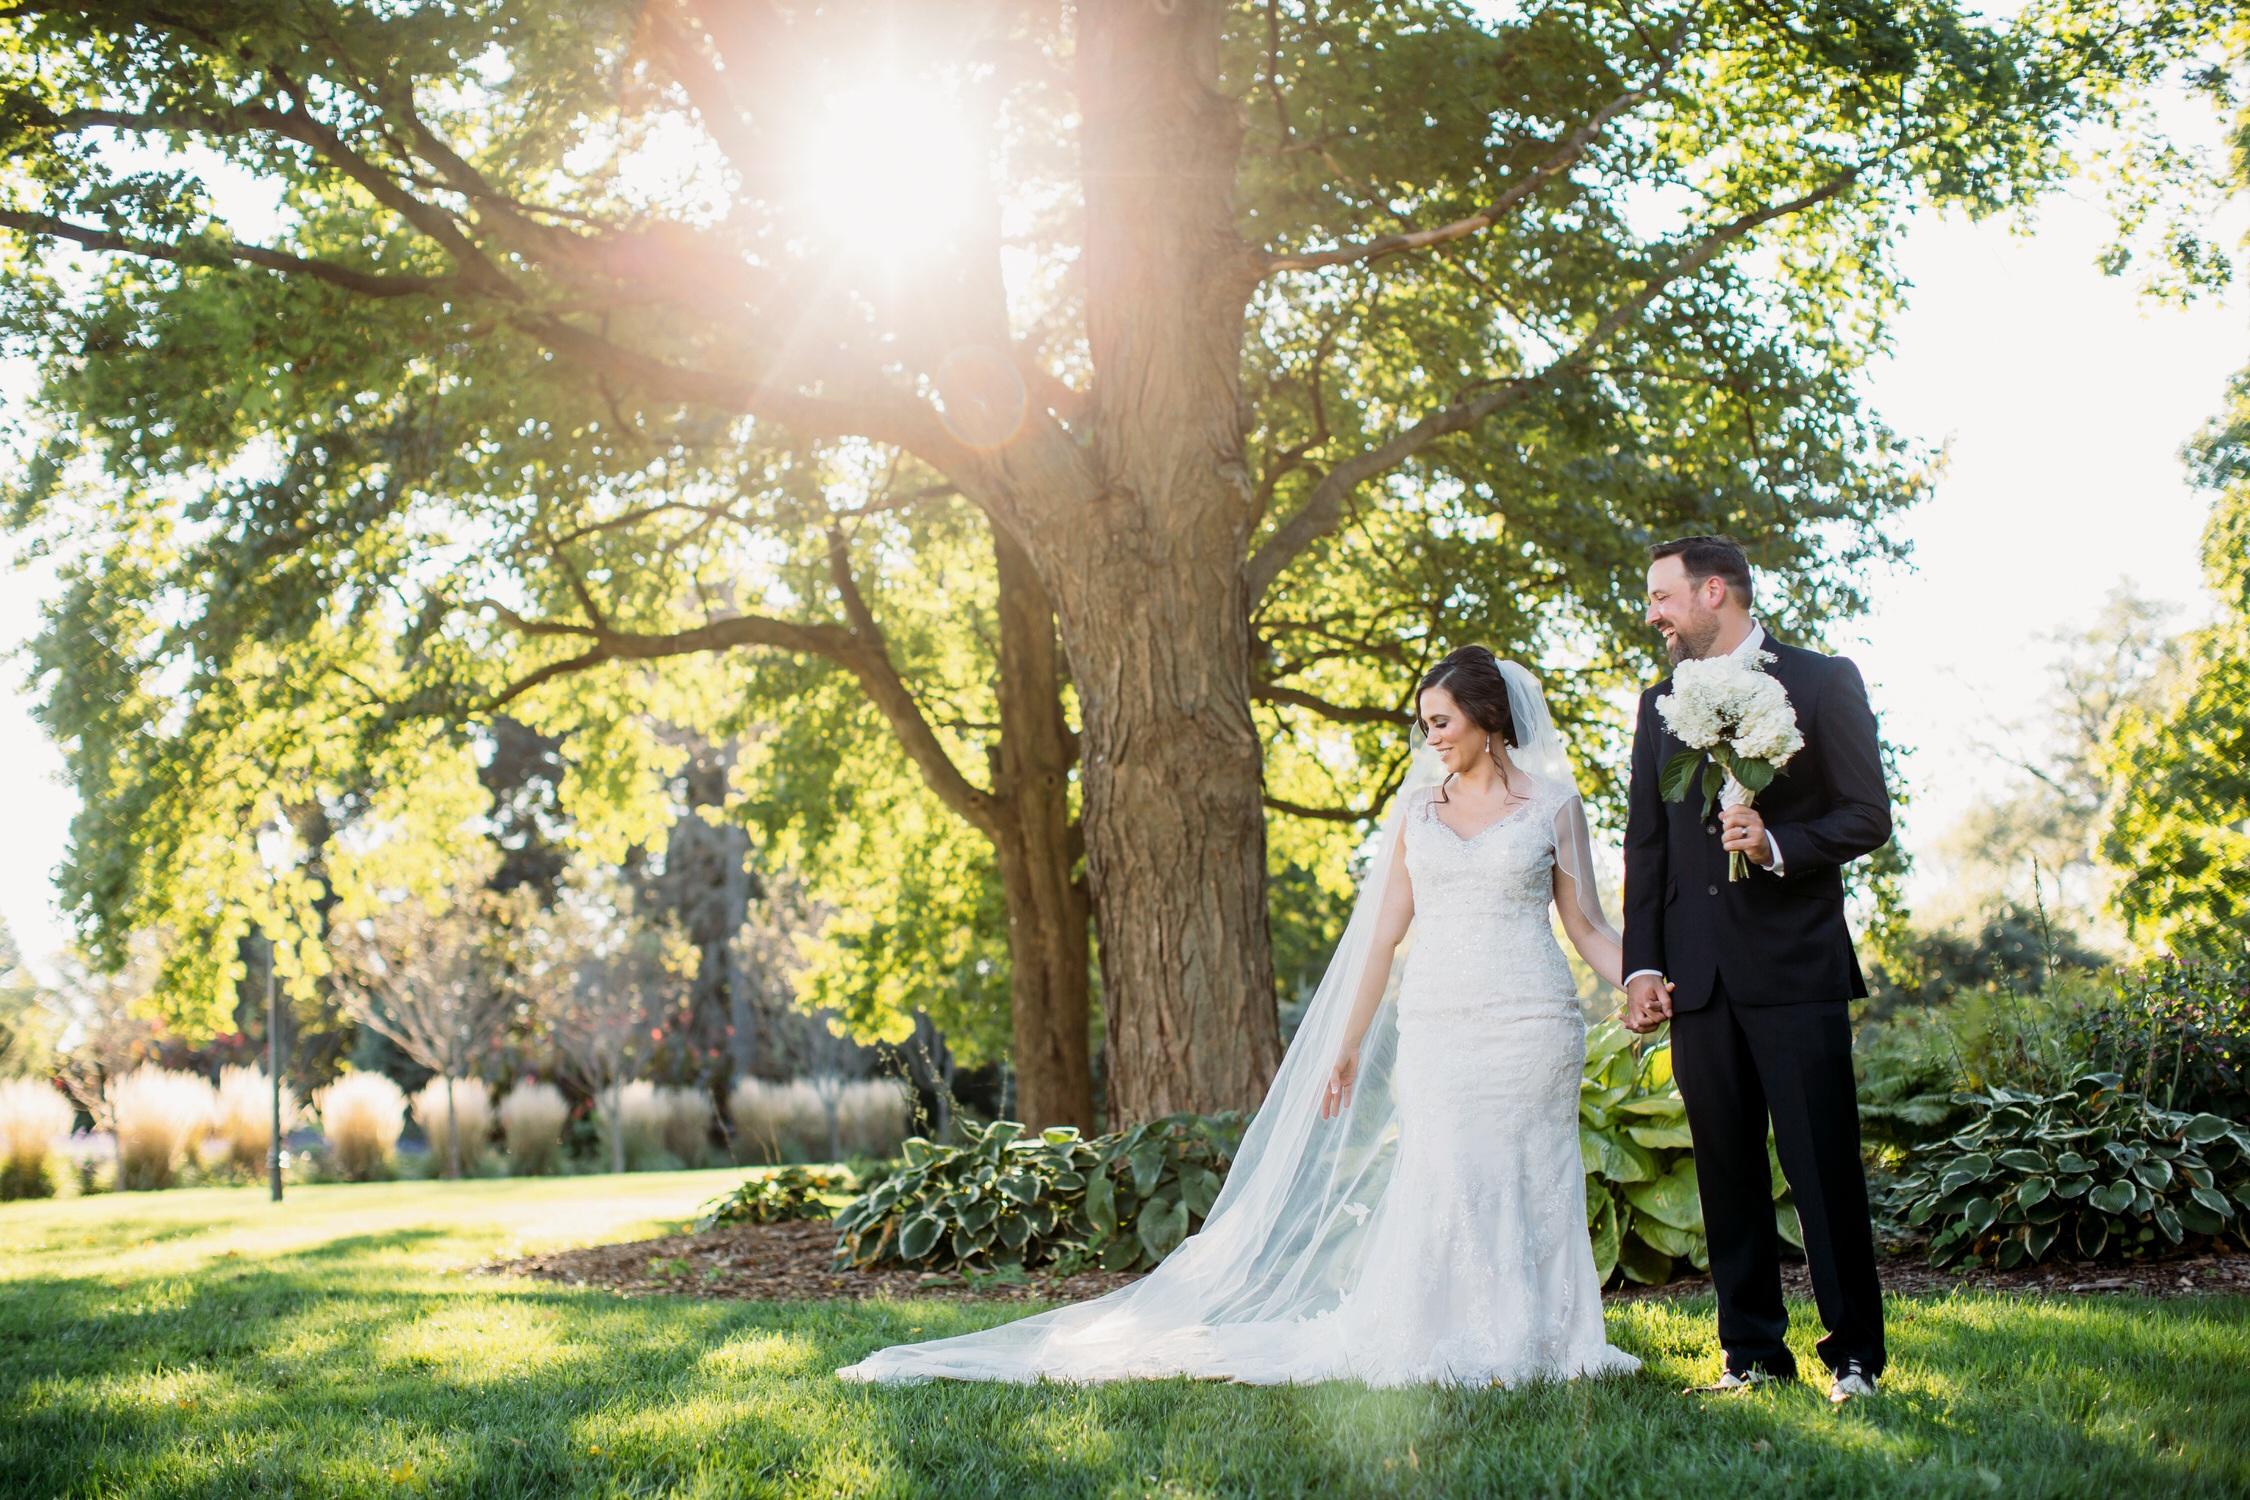 Chicago wedding photographer, bride and groom